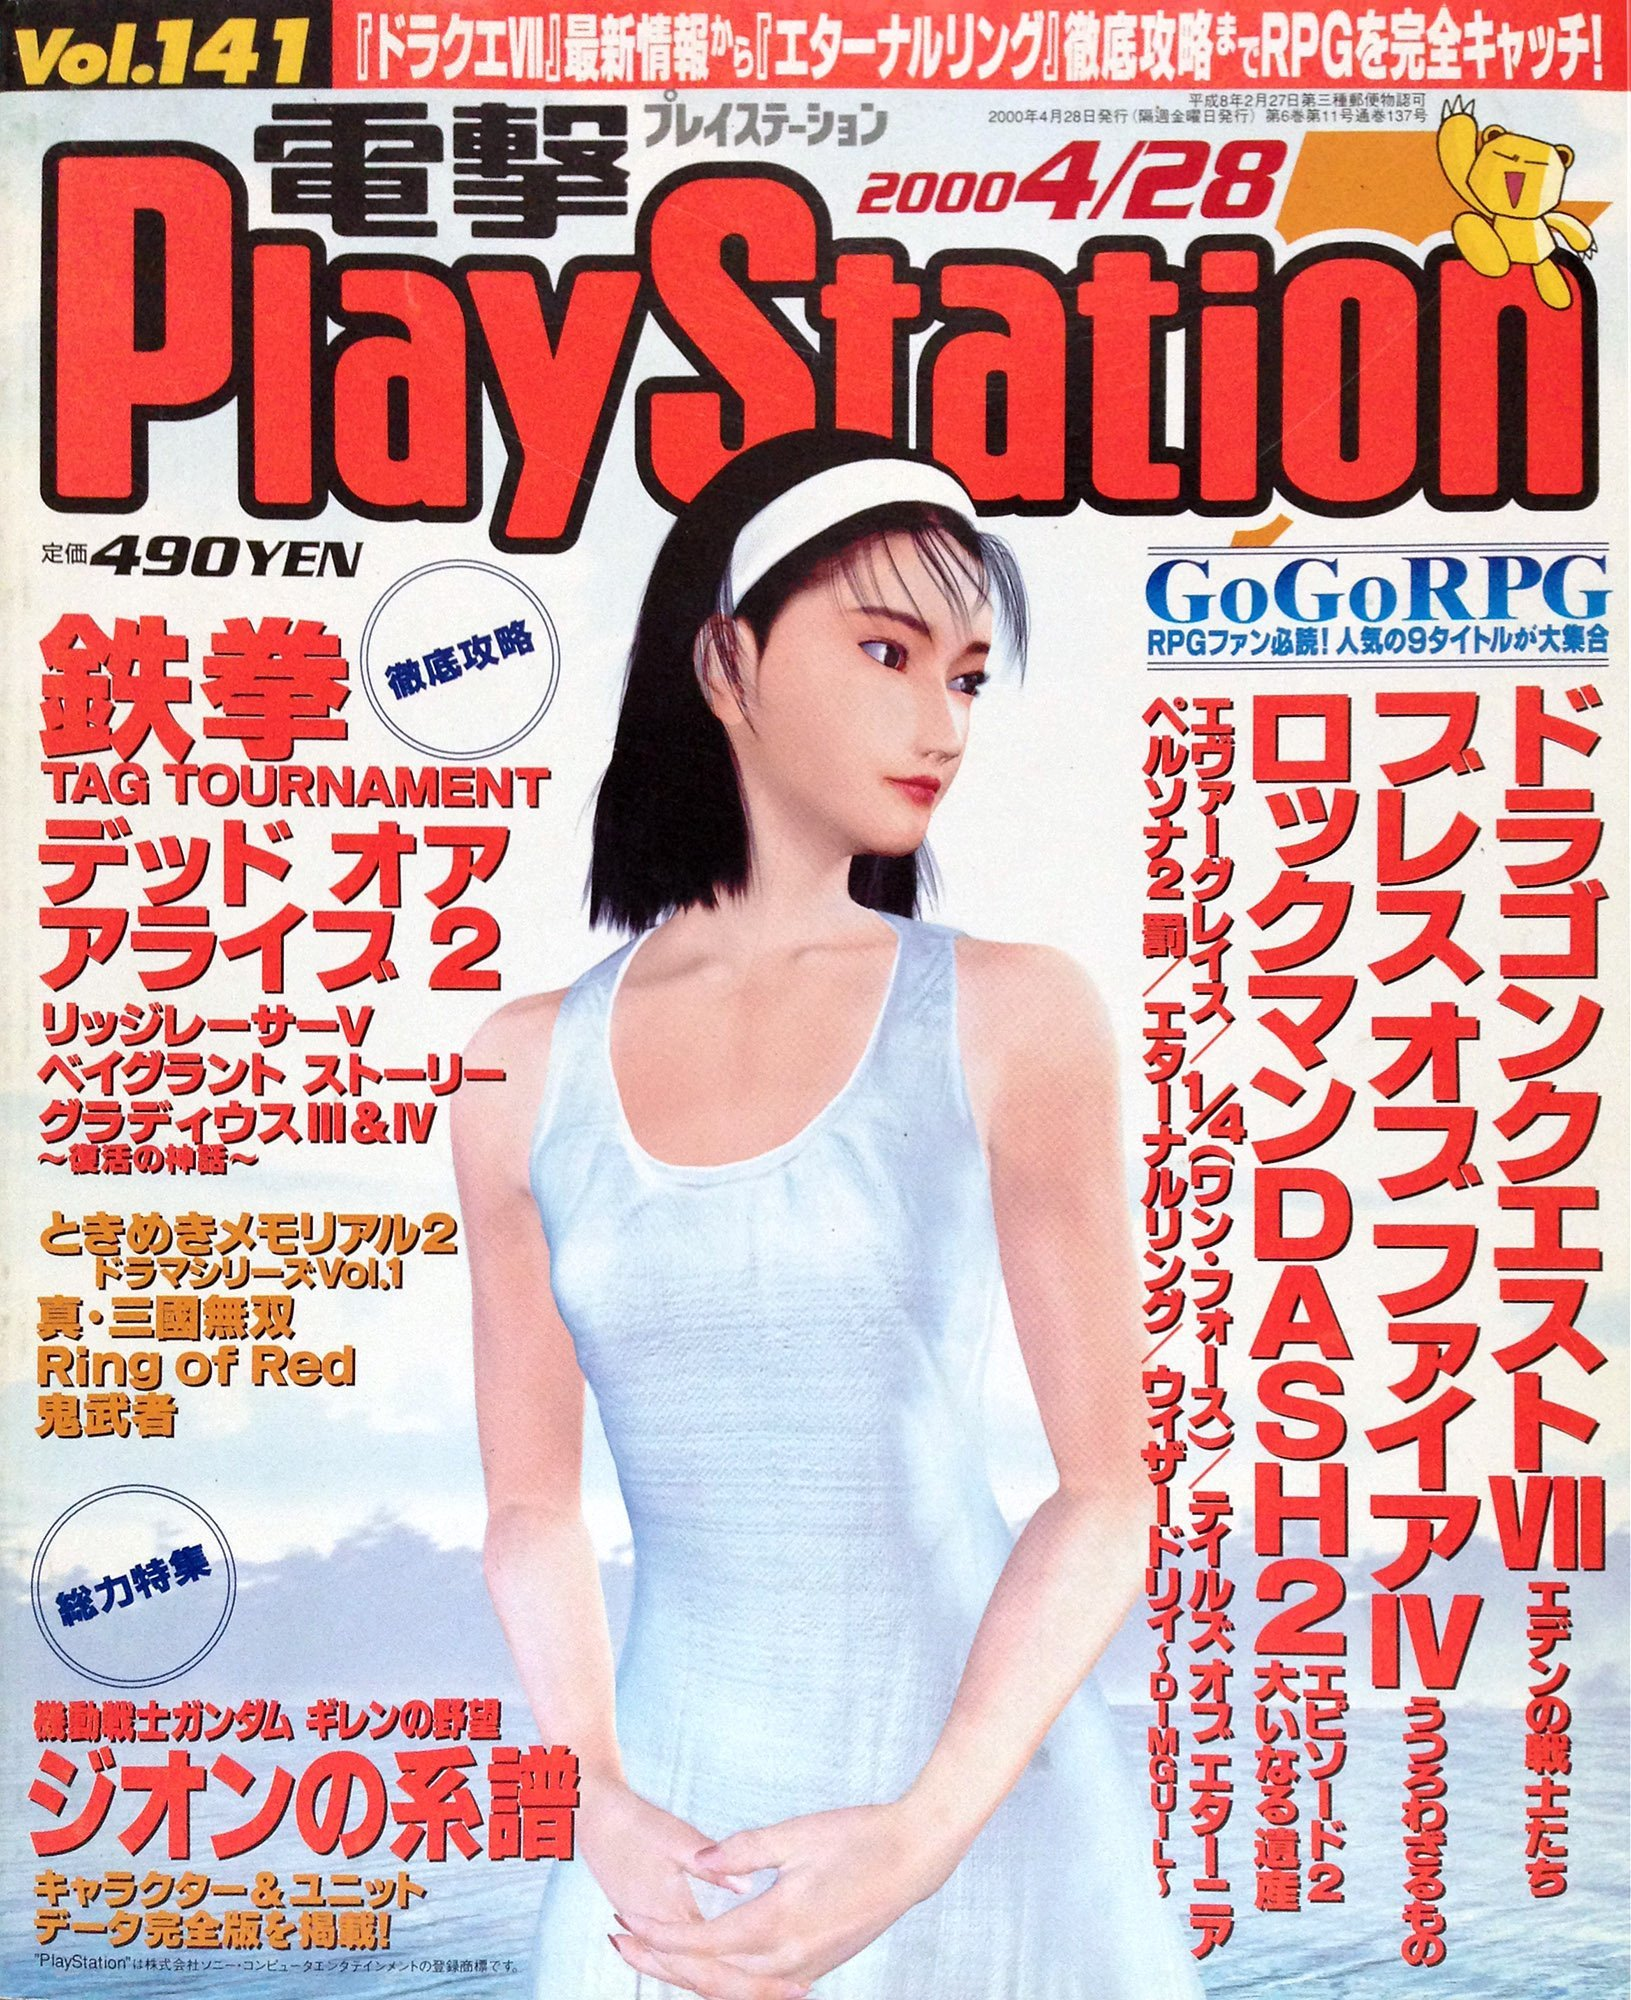 Dengeki PlayStation 141 (April 28, 2000)